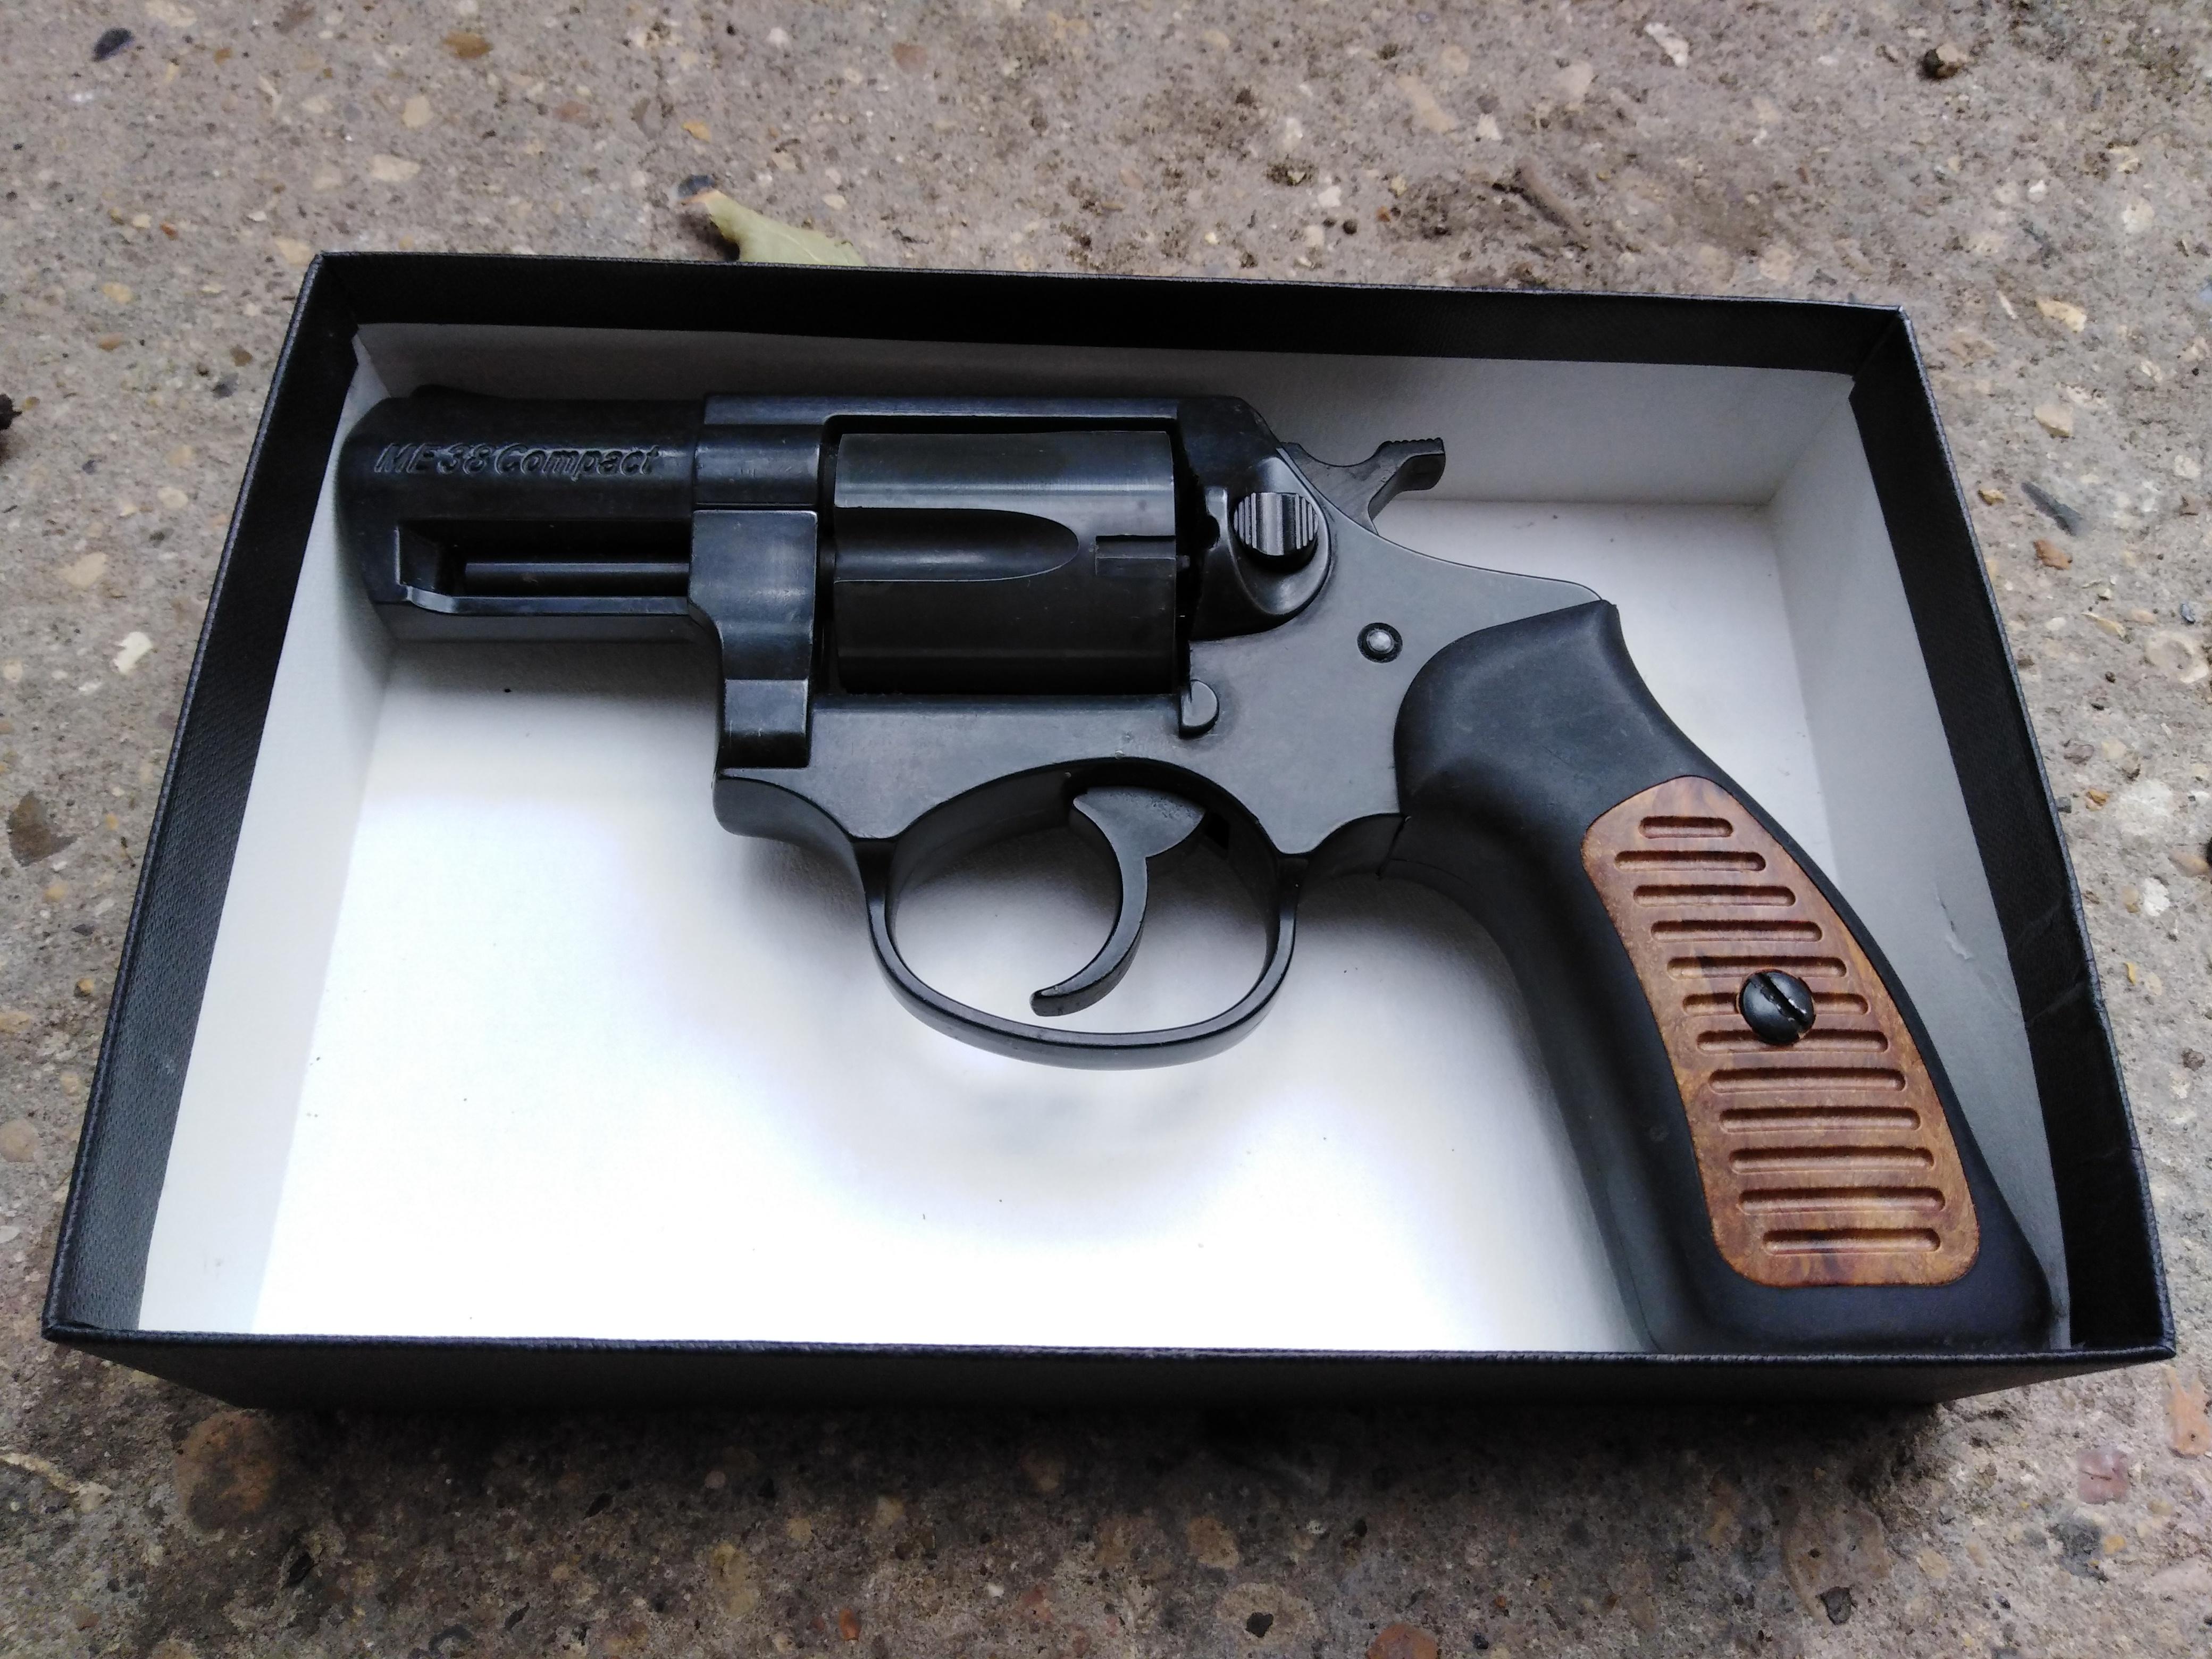 ME38 9mm Blank Snubnose